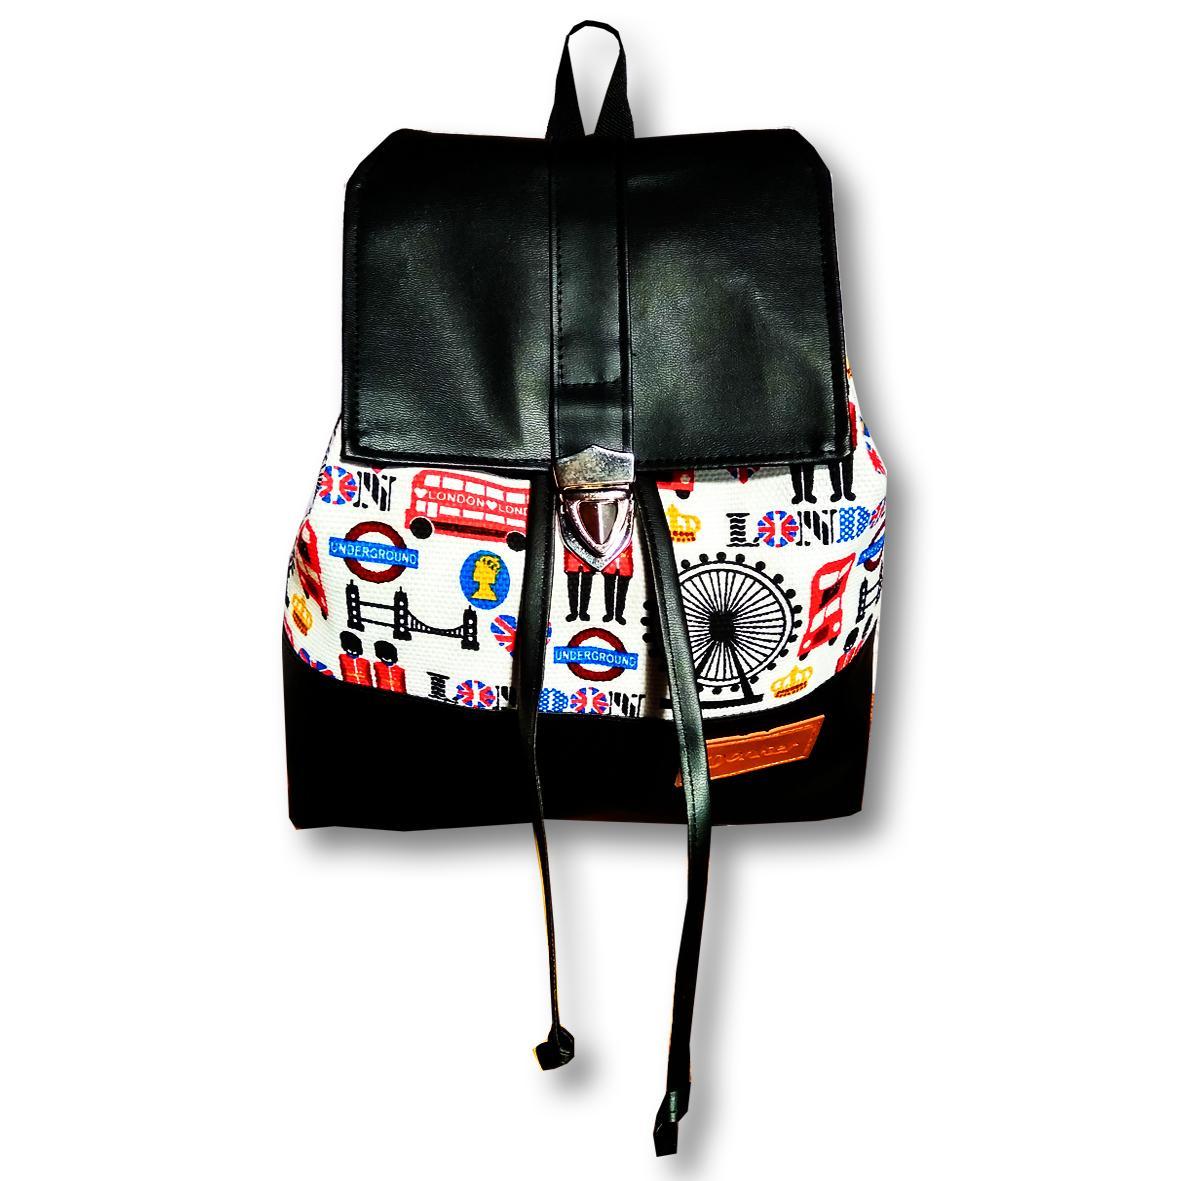 Kehebatan Donker Waterproof Mini Backpack Flamingo Black Tas Wanita Ransel Back Pack London Flip Murah